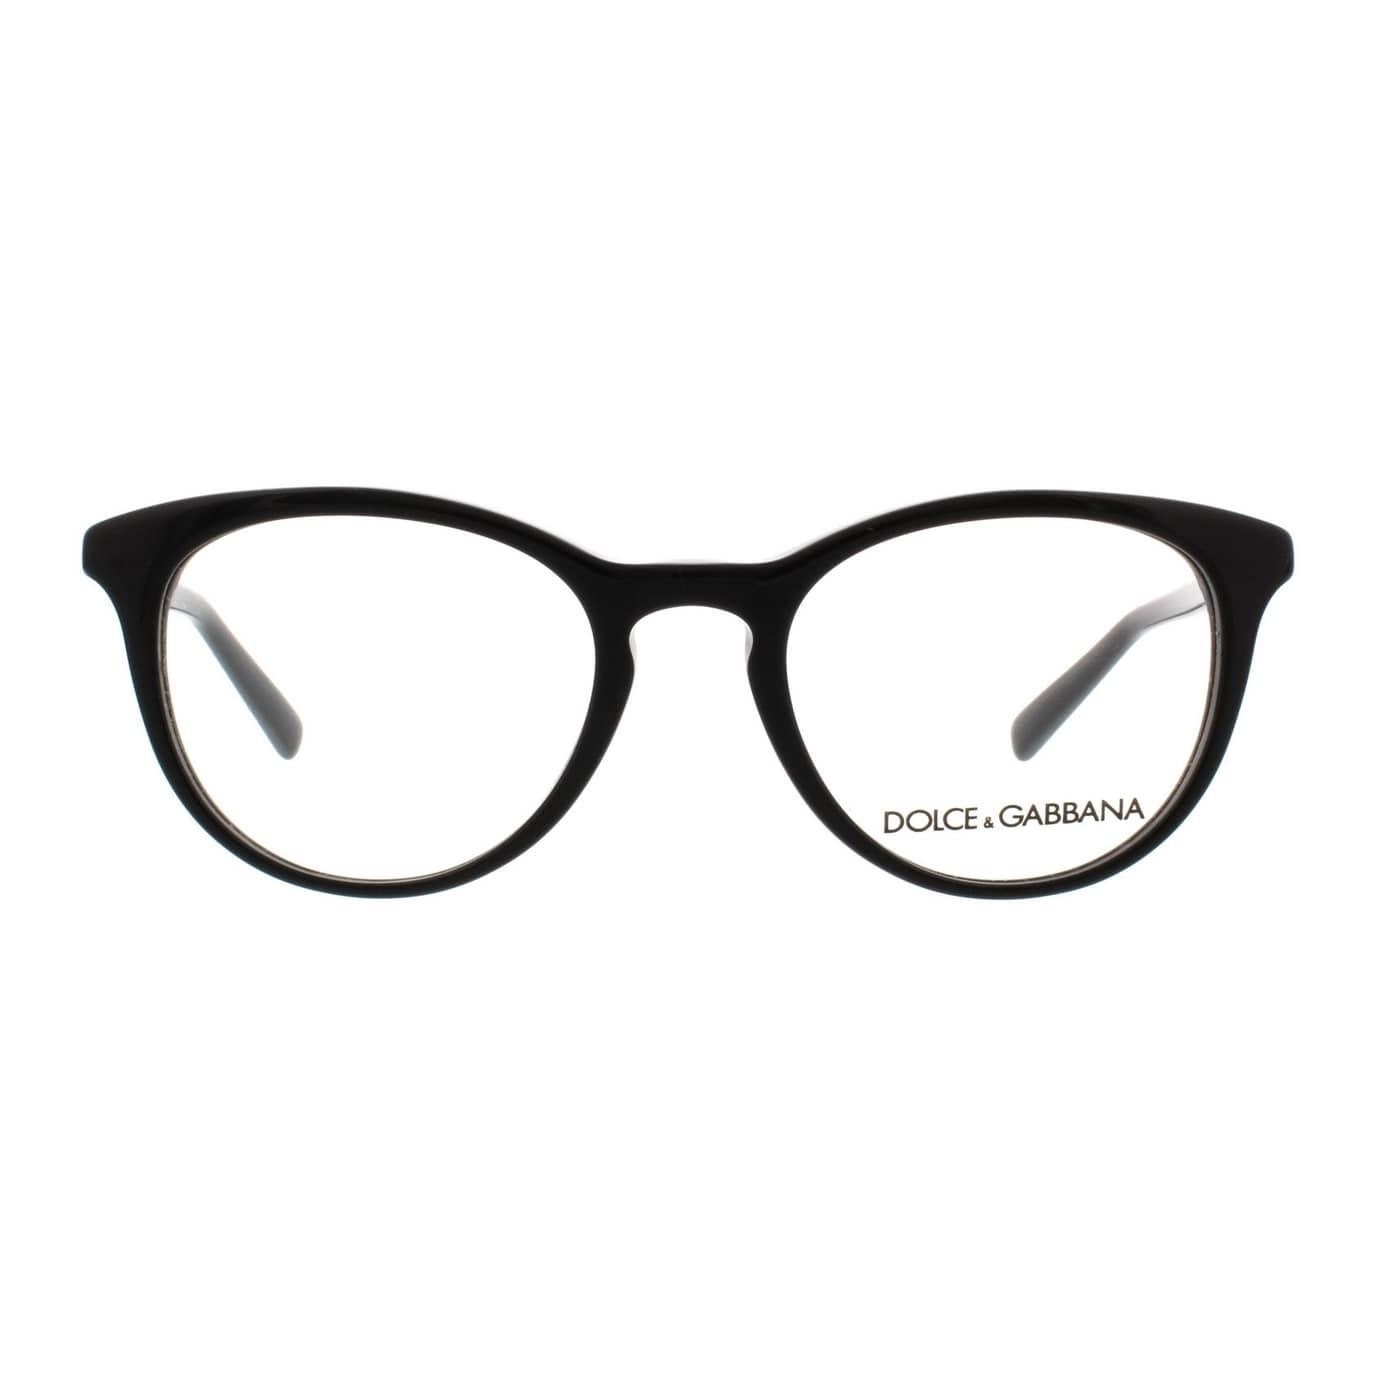 13055efb1e39 Shop Dolce & Gabbana Women's DG3223 501 47 Round Plastic Black Clear  Eyeglasses - Free Shipping Today - Overstock - 14791159